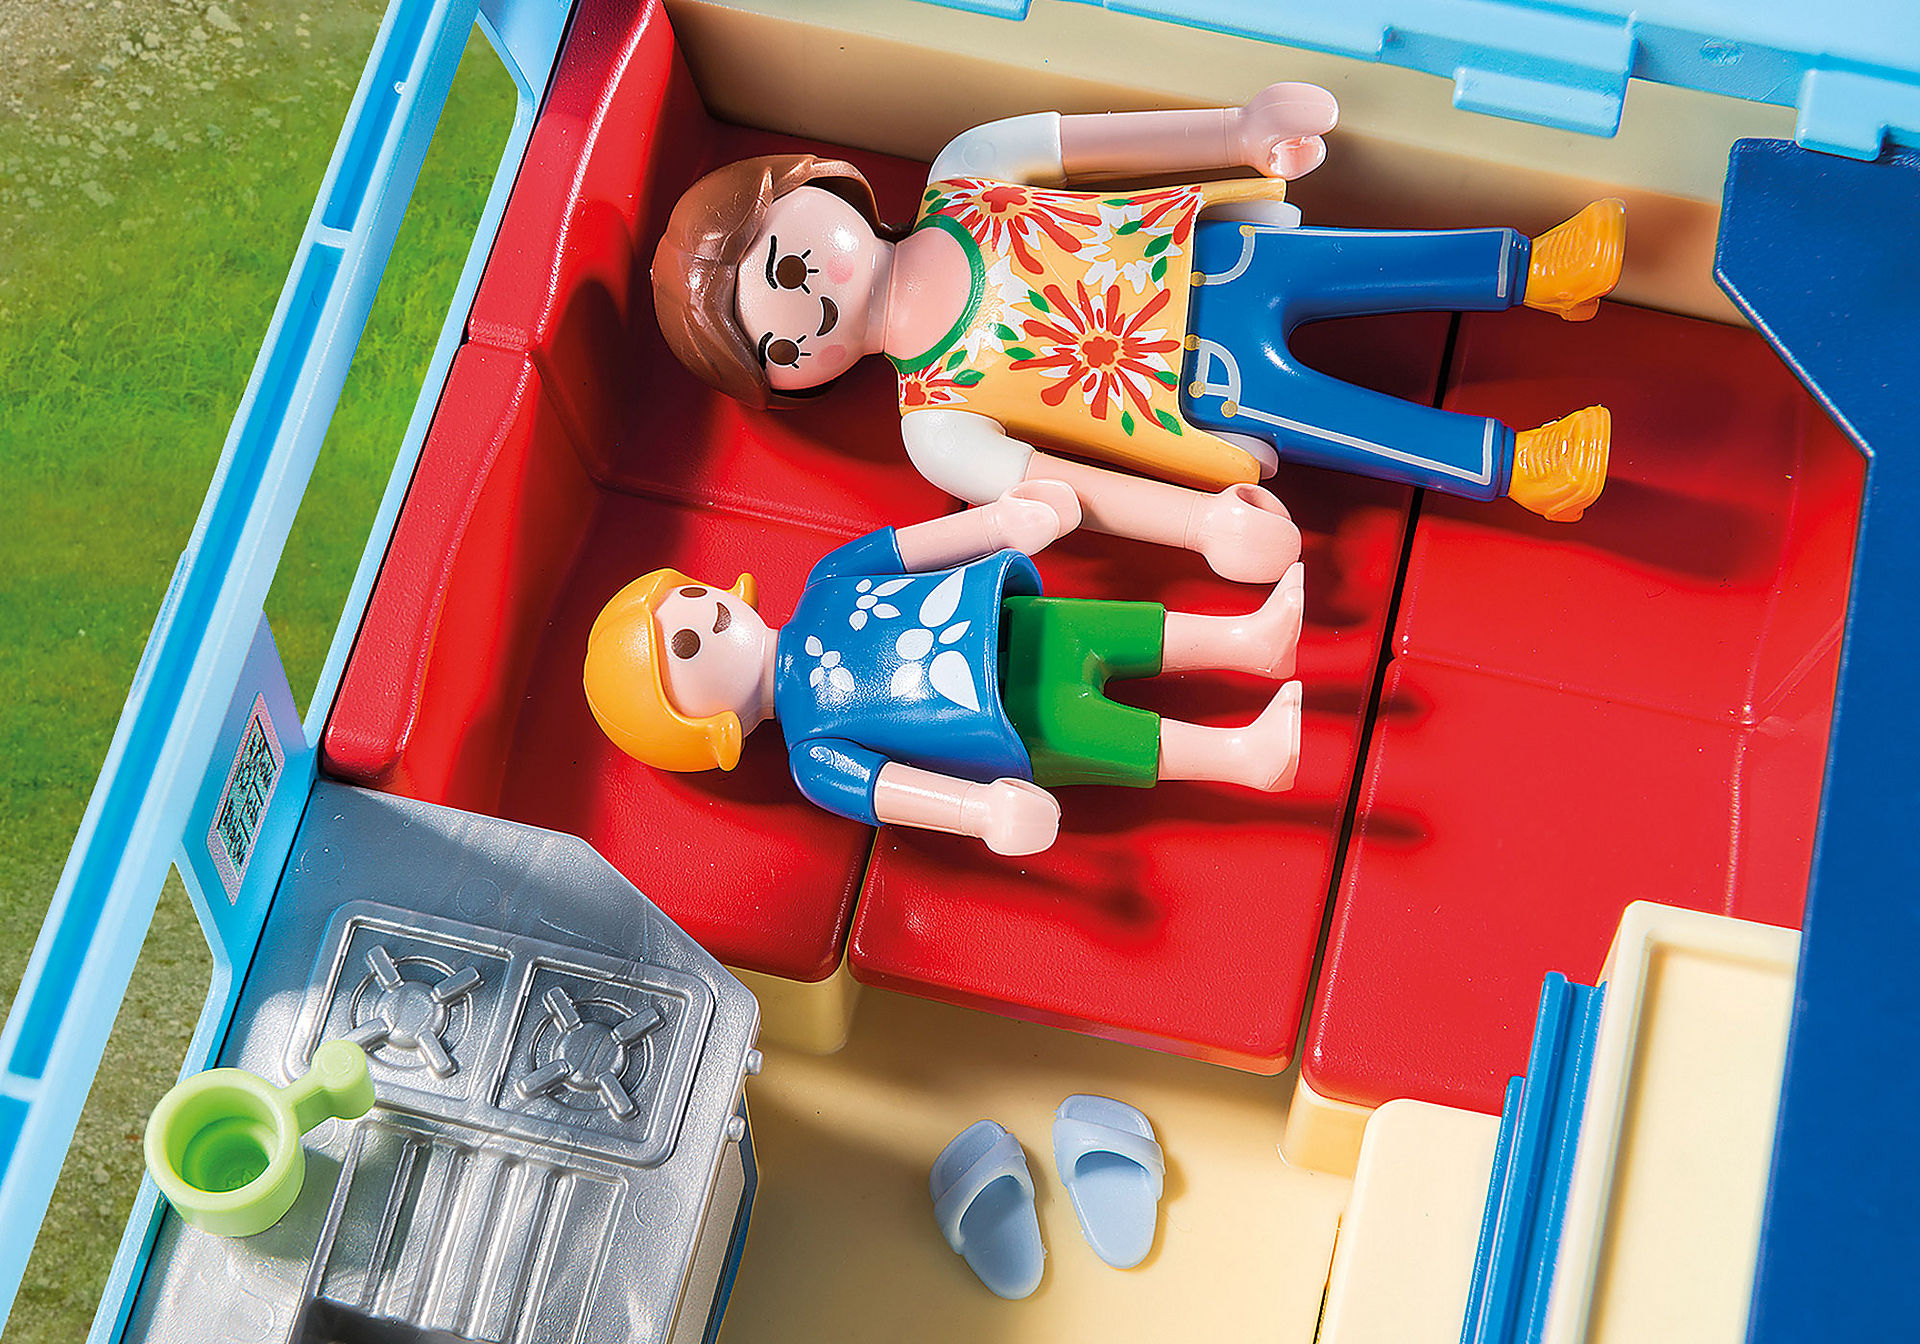 http://media.playmobil.com/i/playmobil/9502_product_extra3/Playmobil-Pick-Up mit Wohnwagen